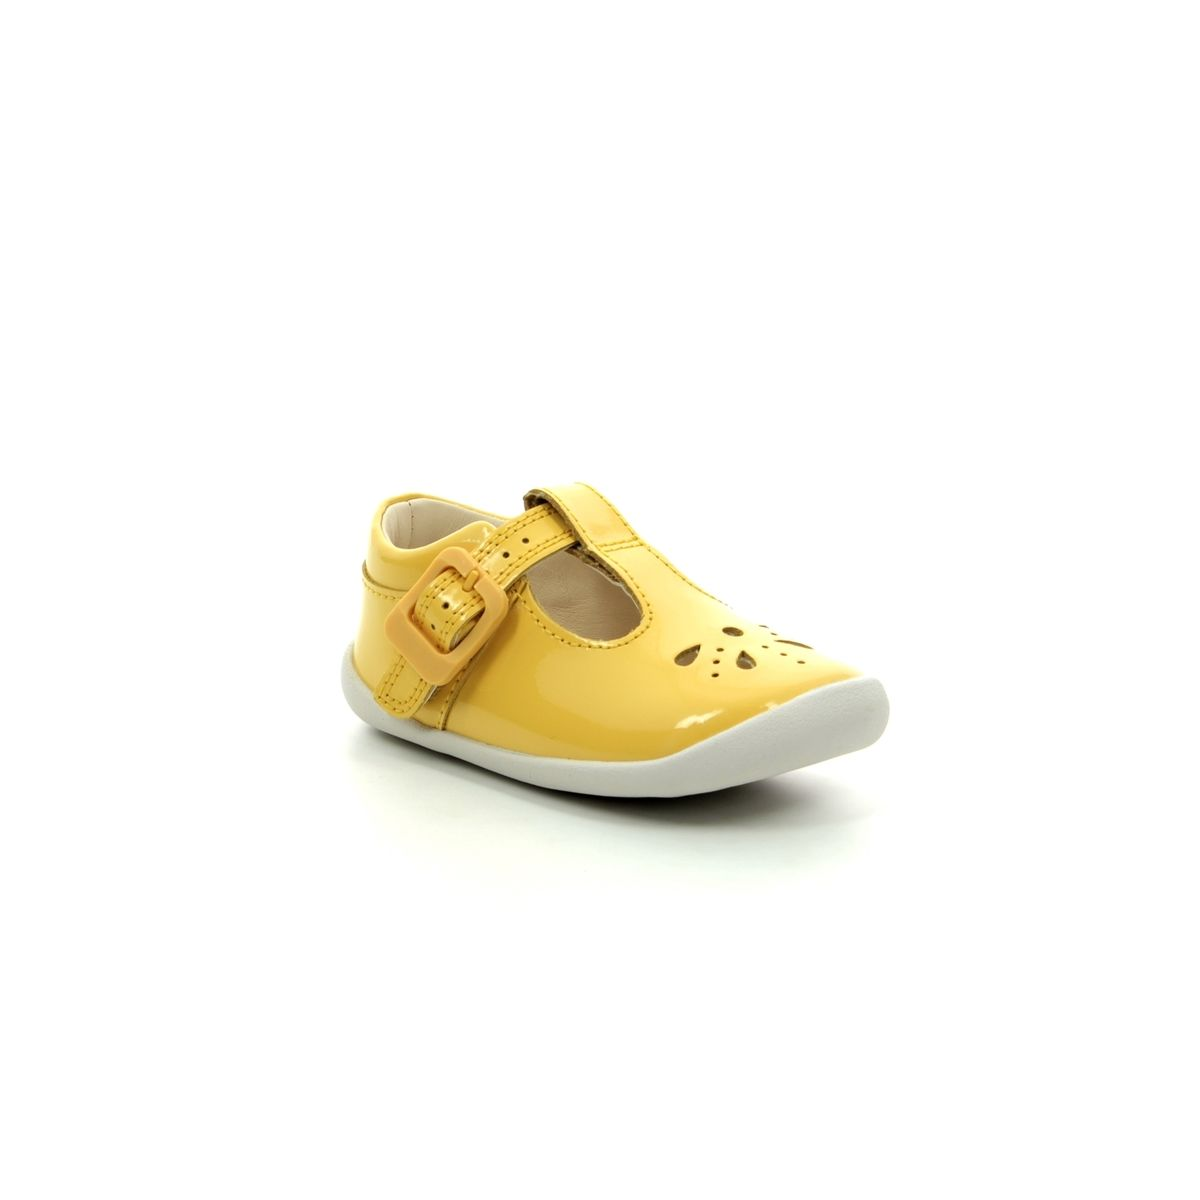 b3dd2c9d23e Clarks First Shoes - Yellow Patent - 422826F ROAMER STAR T